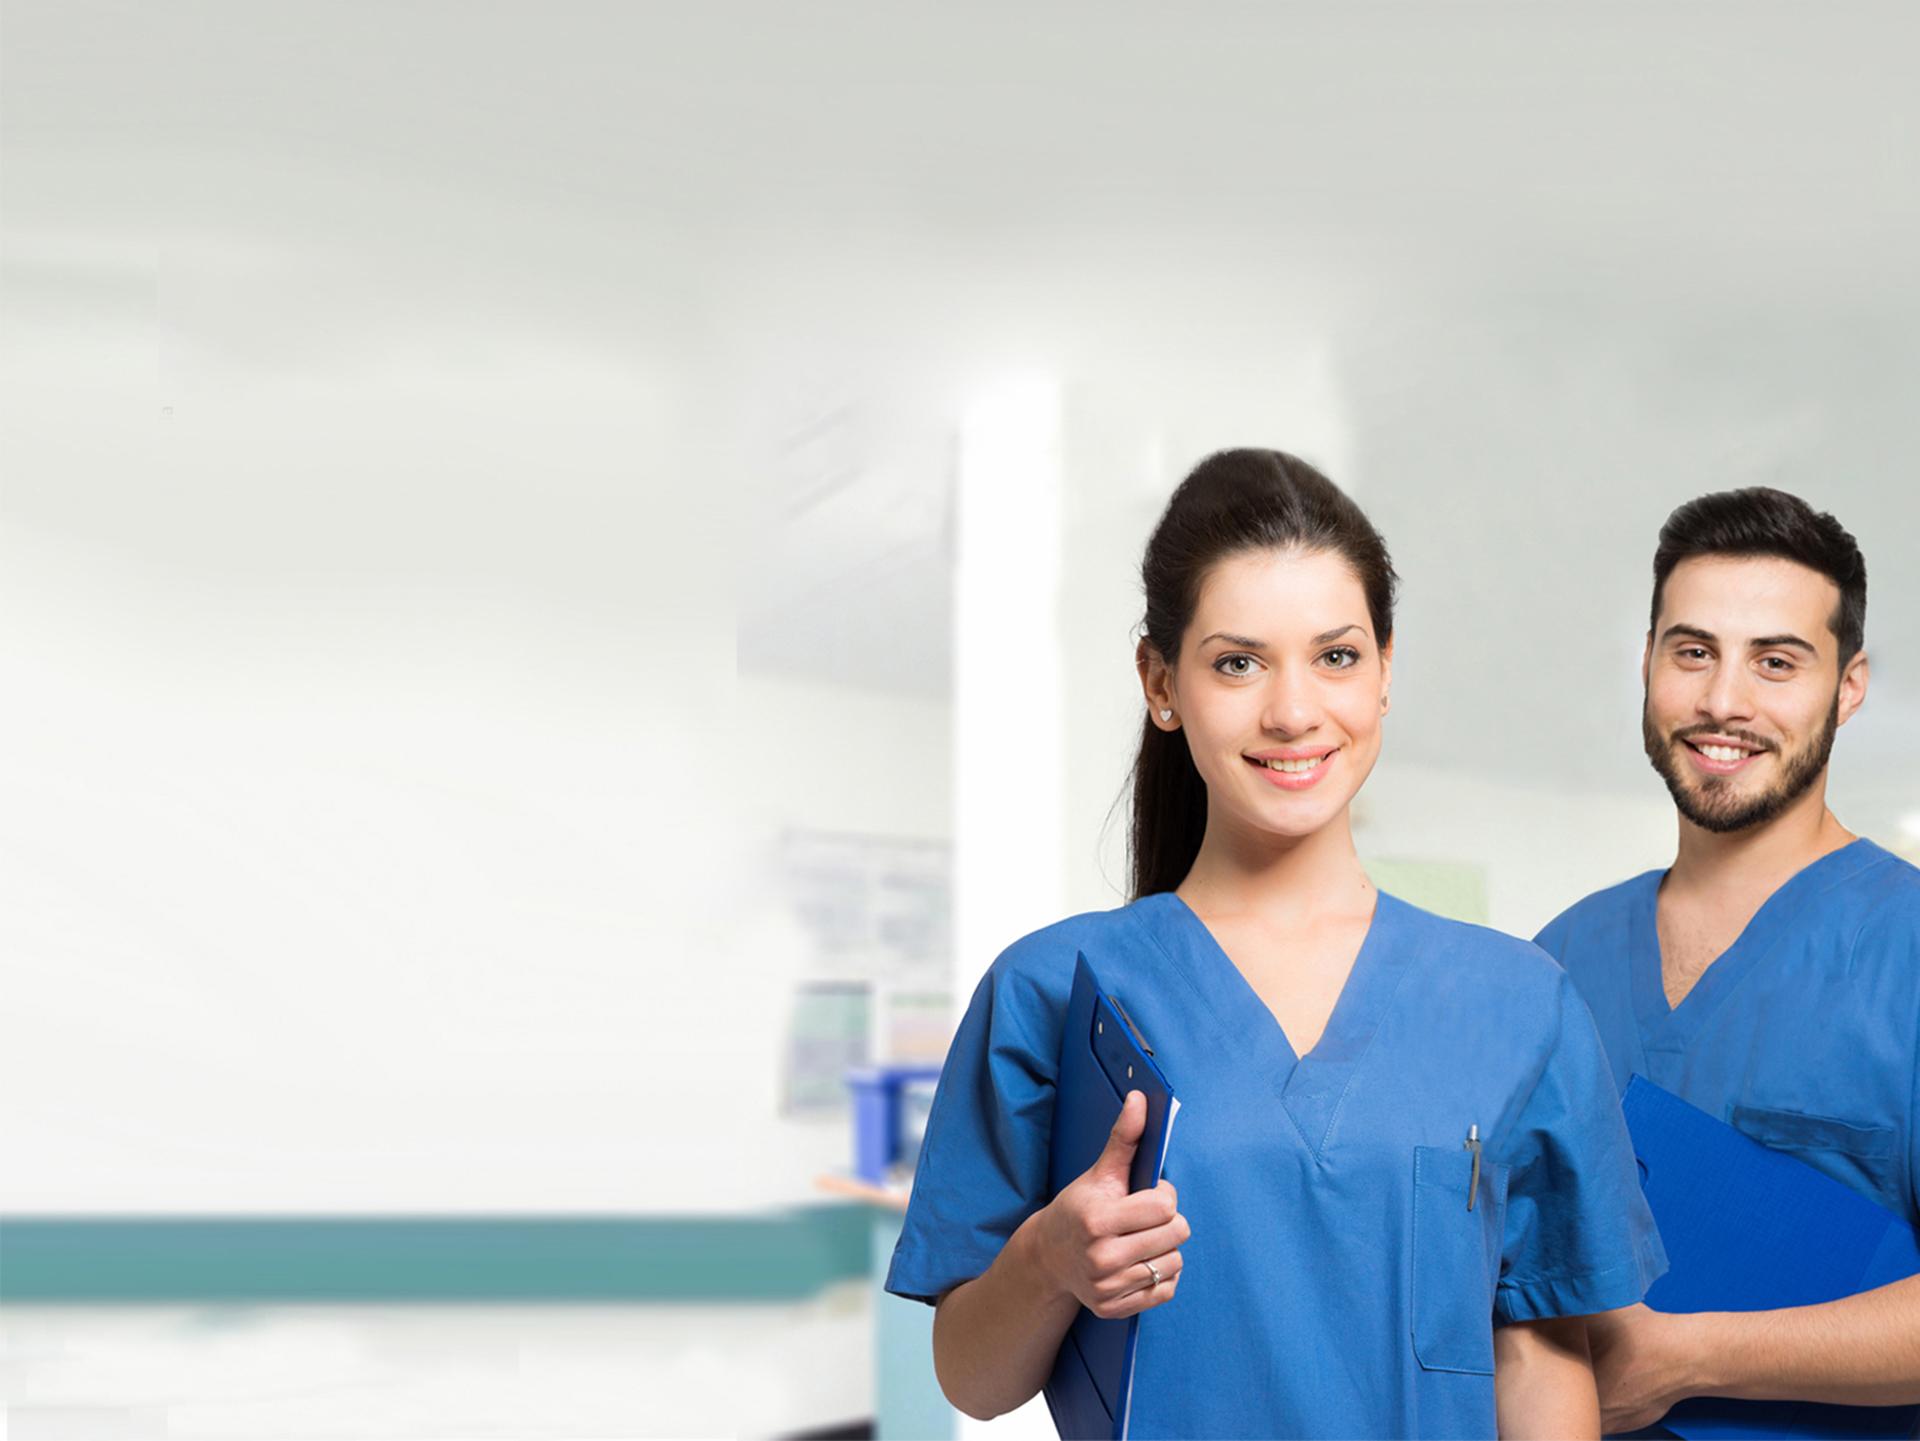 medizin ulm studienverlaufsplan